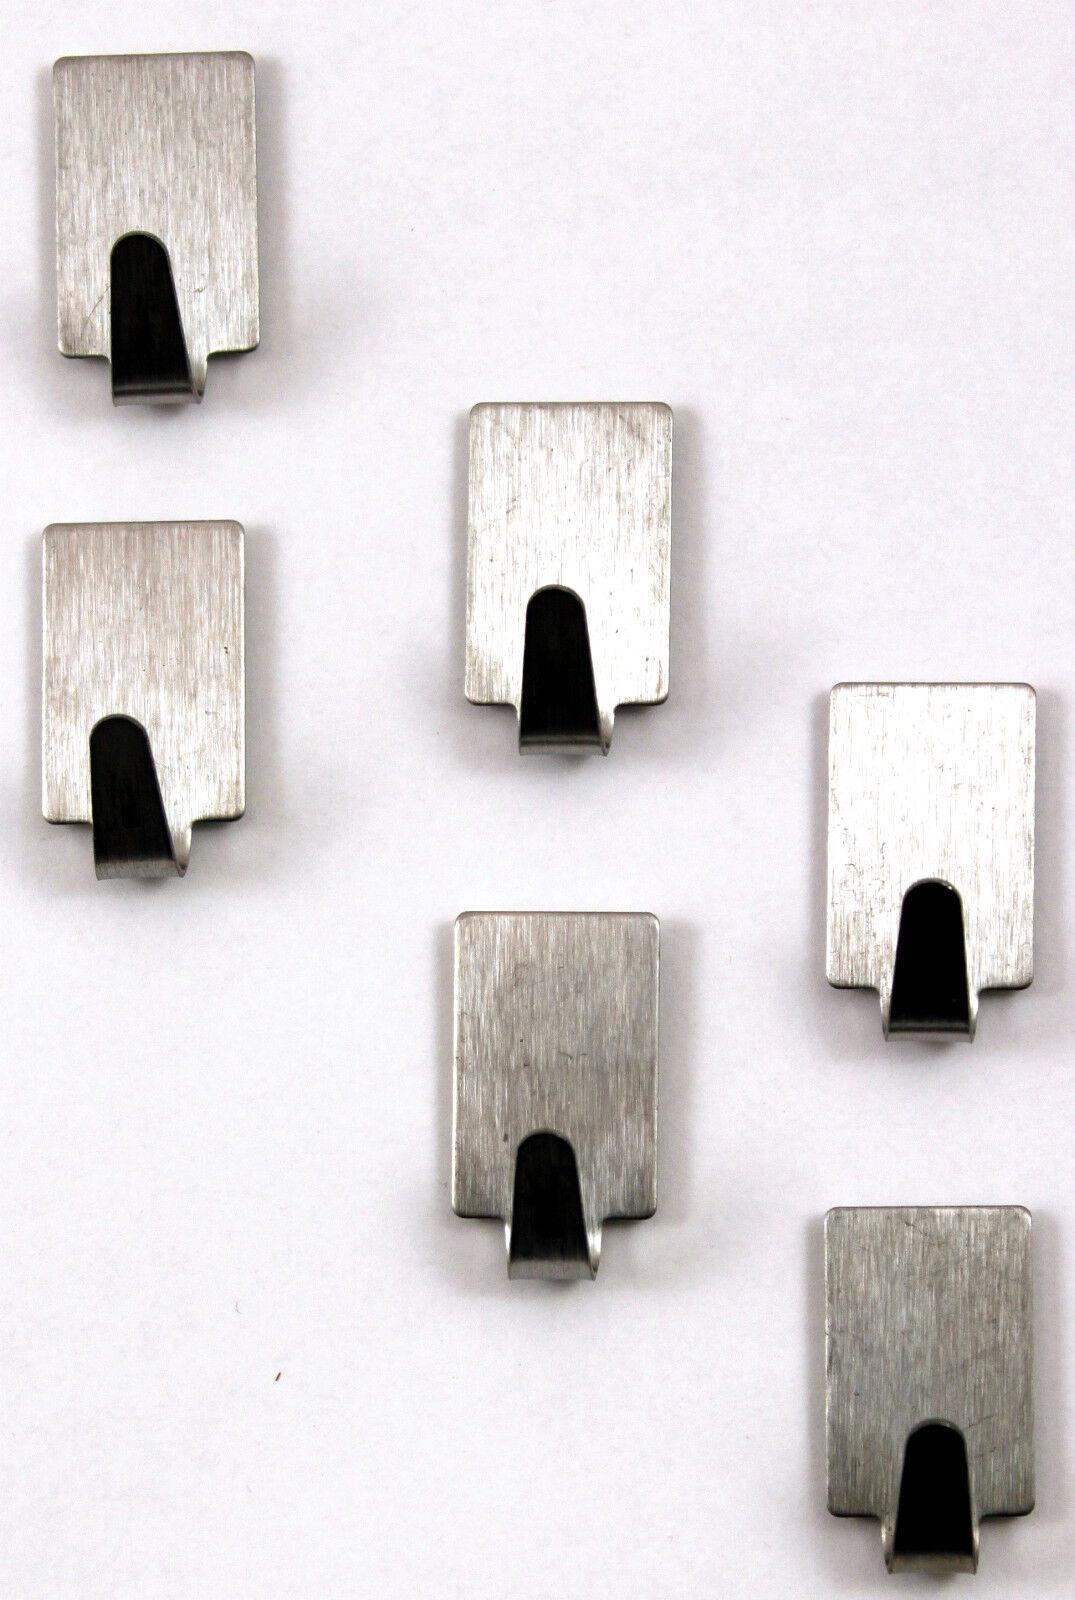 Gancio Adesivo 576 pezzi in Acciaio Inox Inox Inox Ganci Asciugamano Gancio Gancio Parete Ganci badhaken 790 8985d1